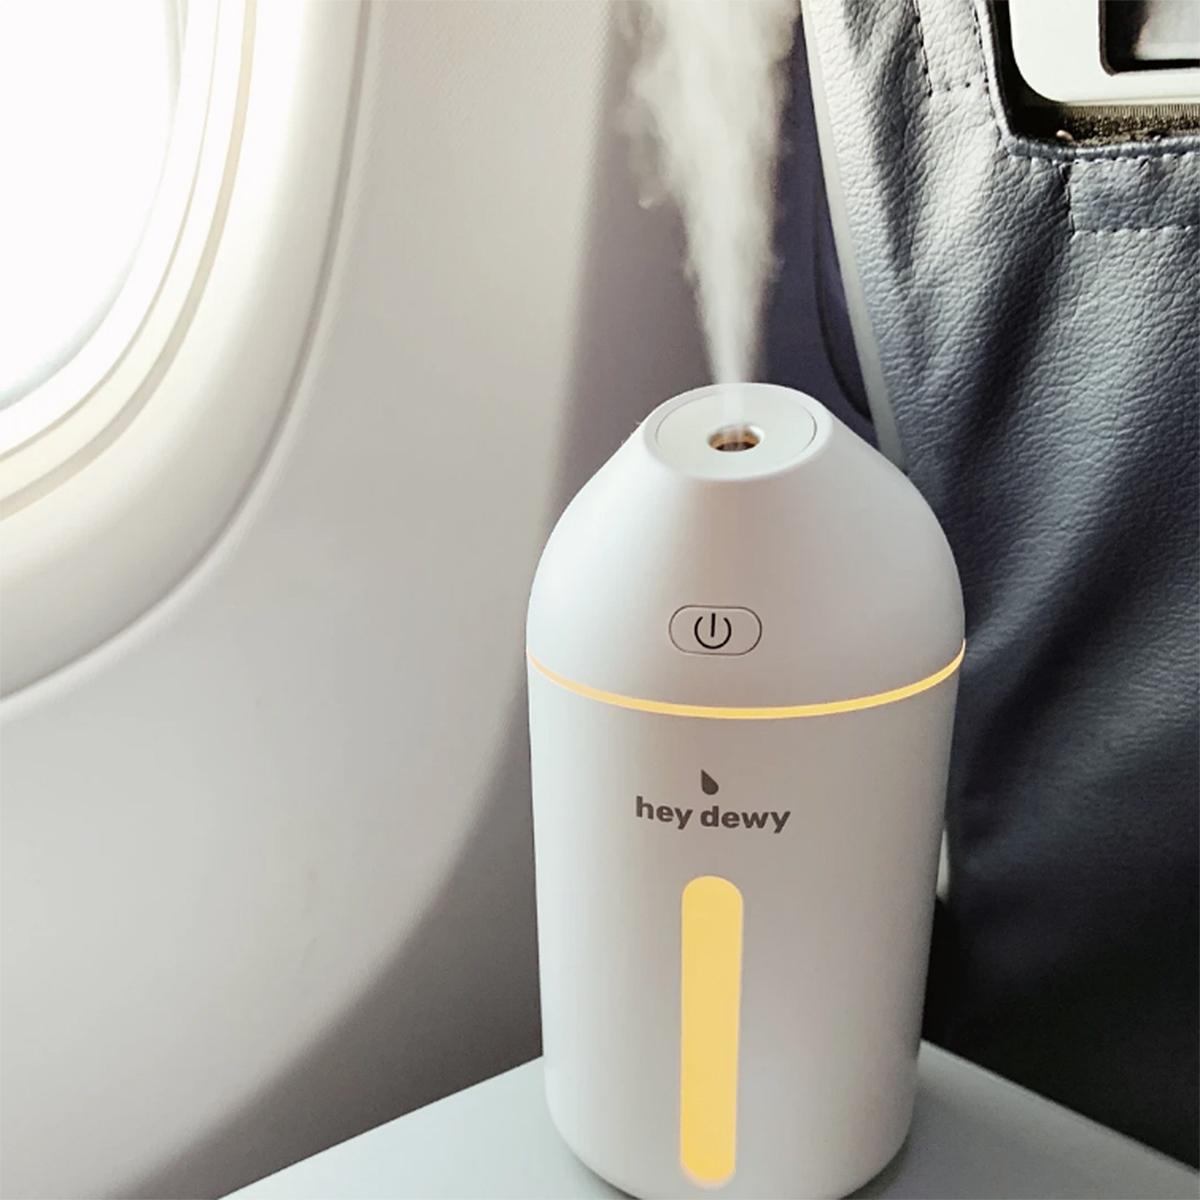 Hey Dewy Portable Facial Humidifier